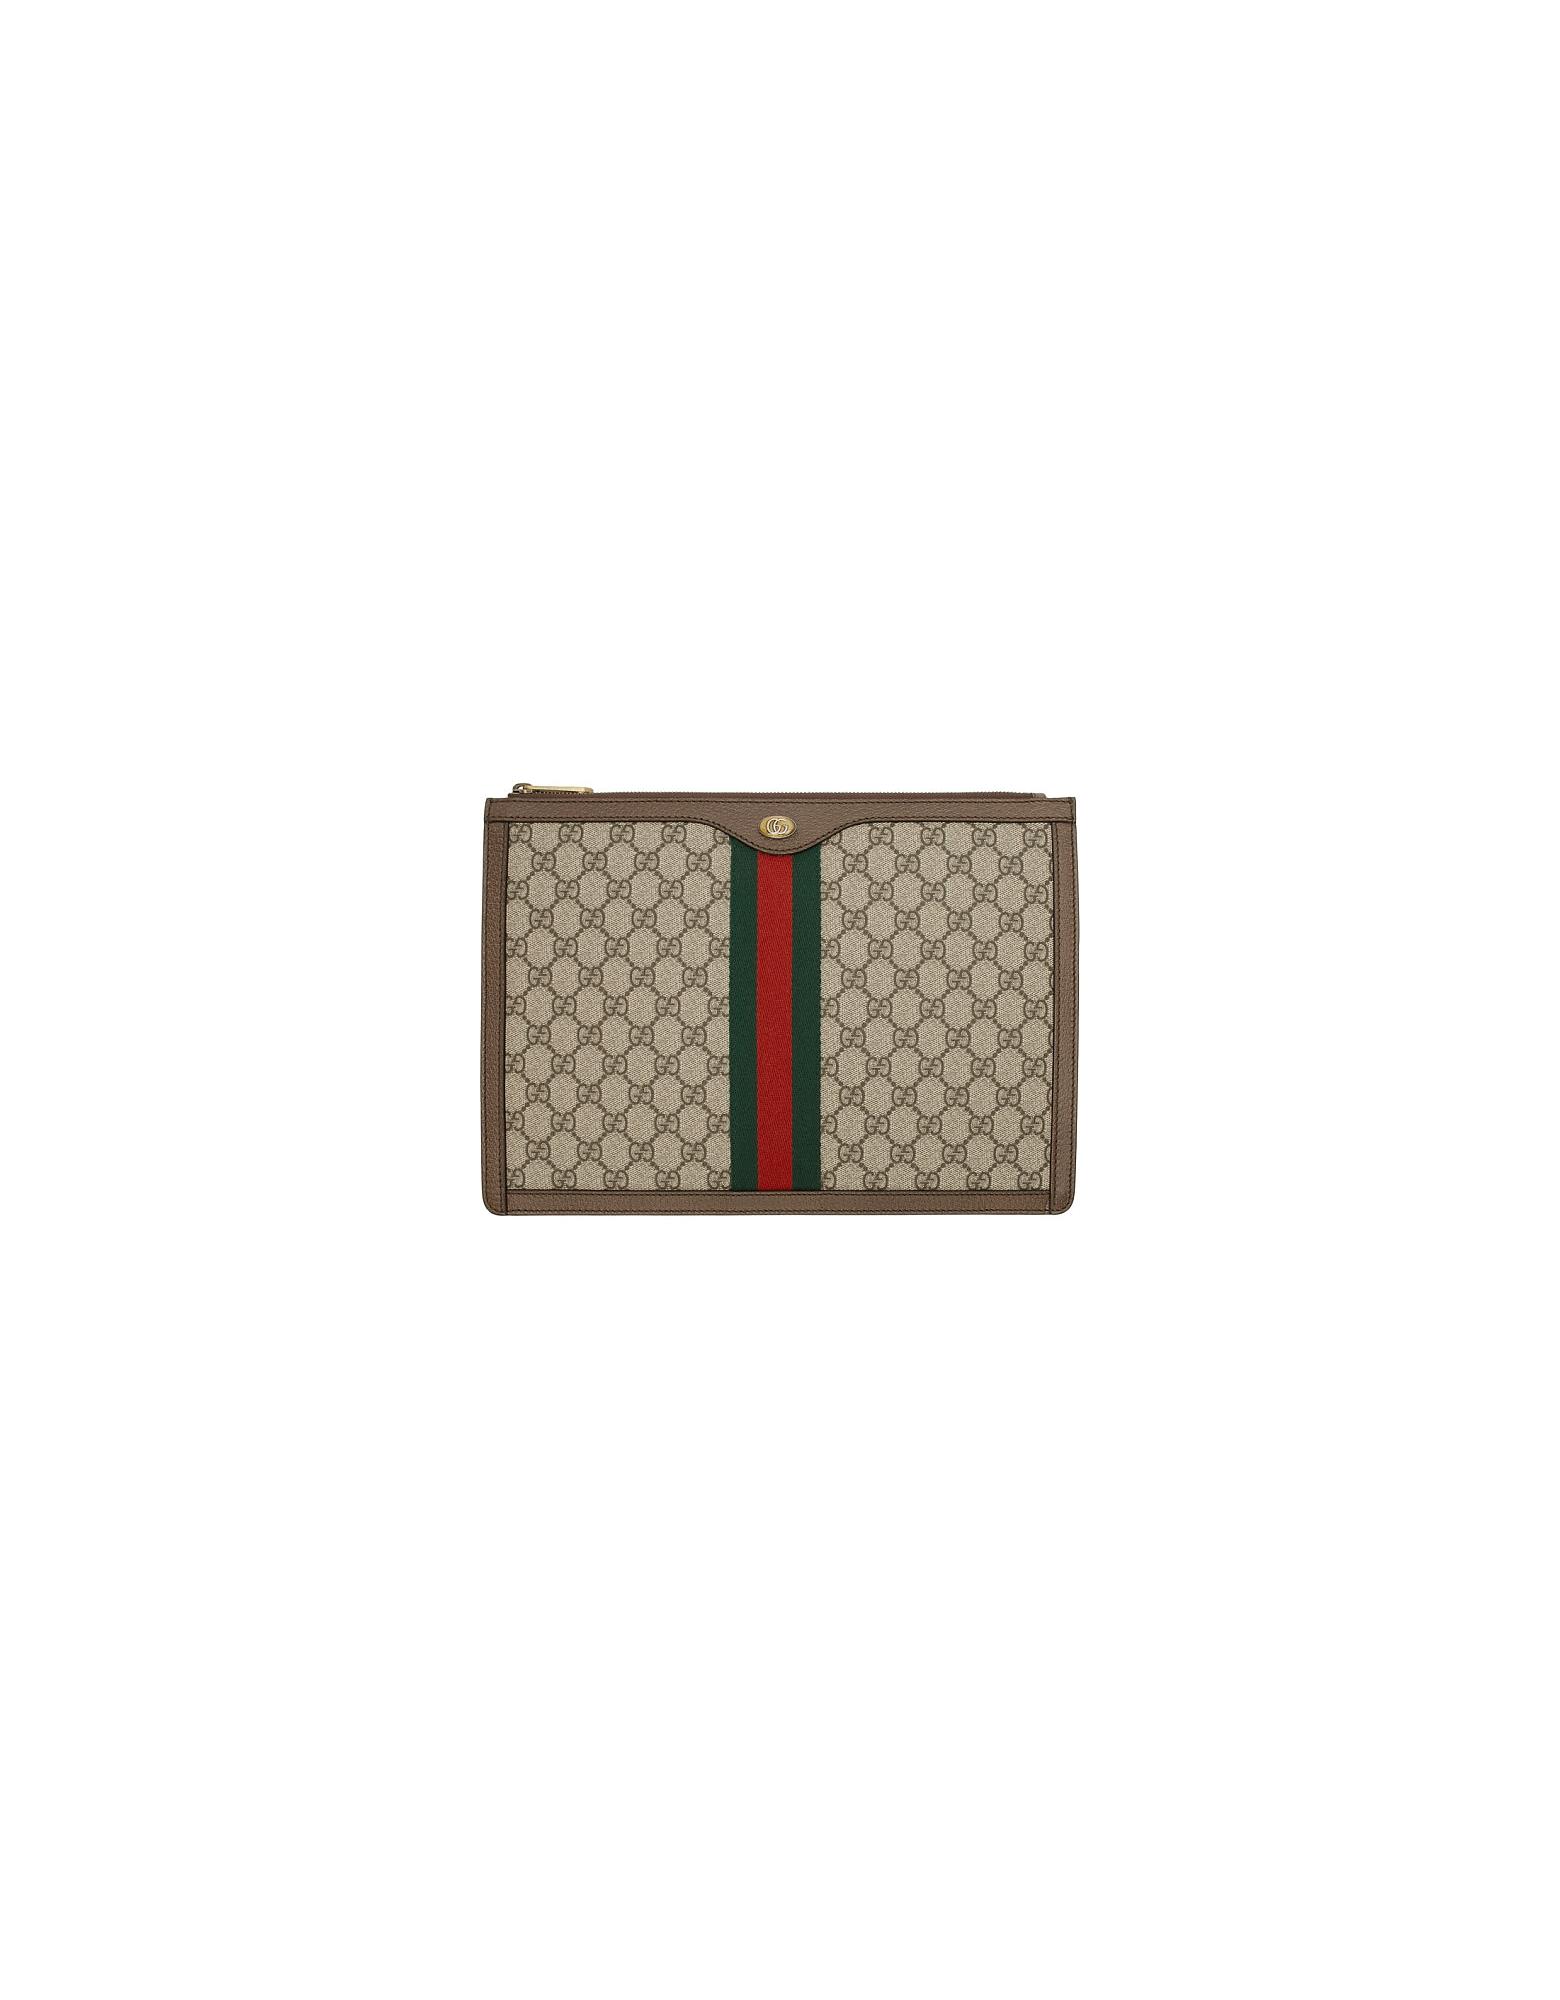 Gucci Designer Handbags, Brown GG Supreme Ophidia Portfolio